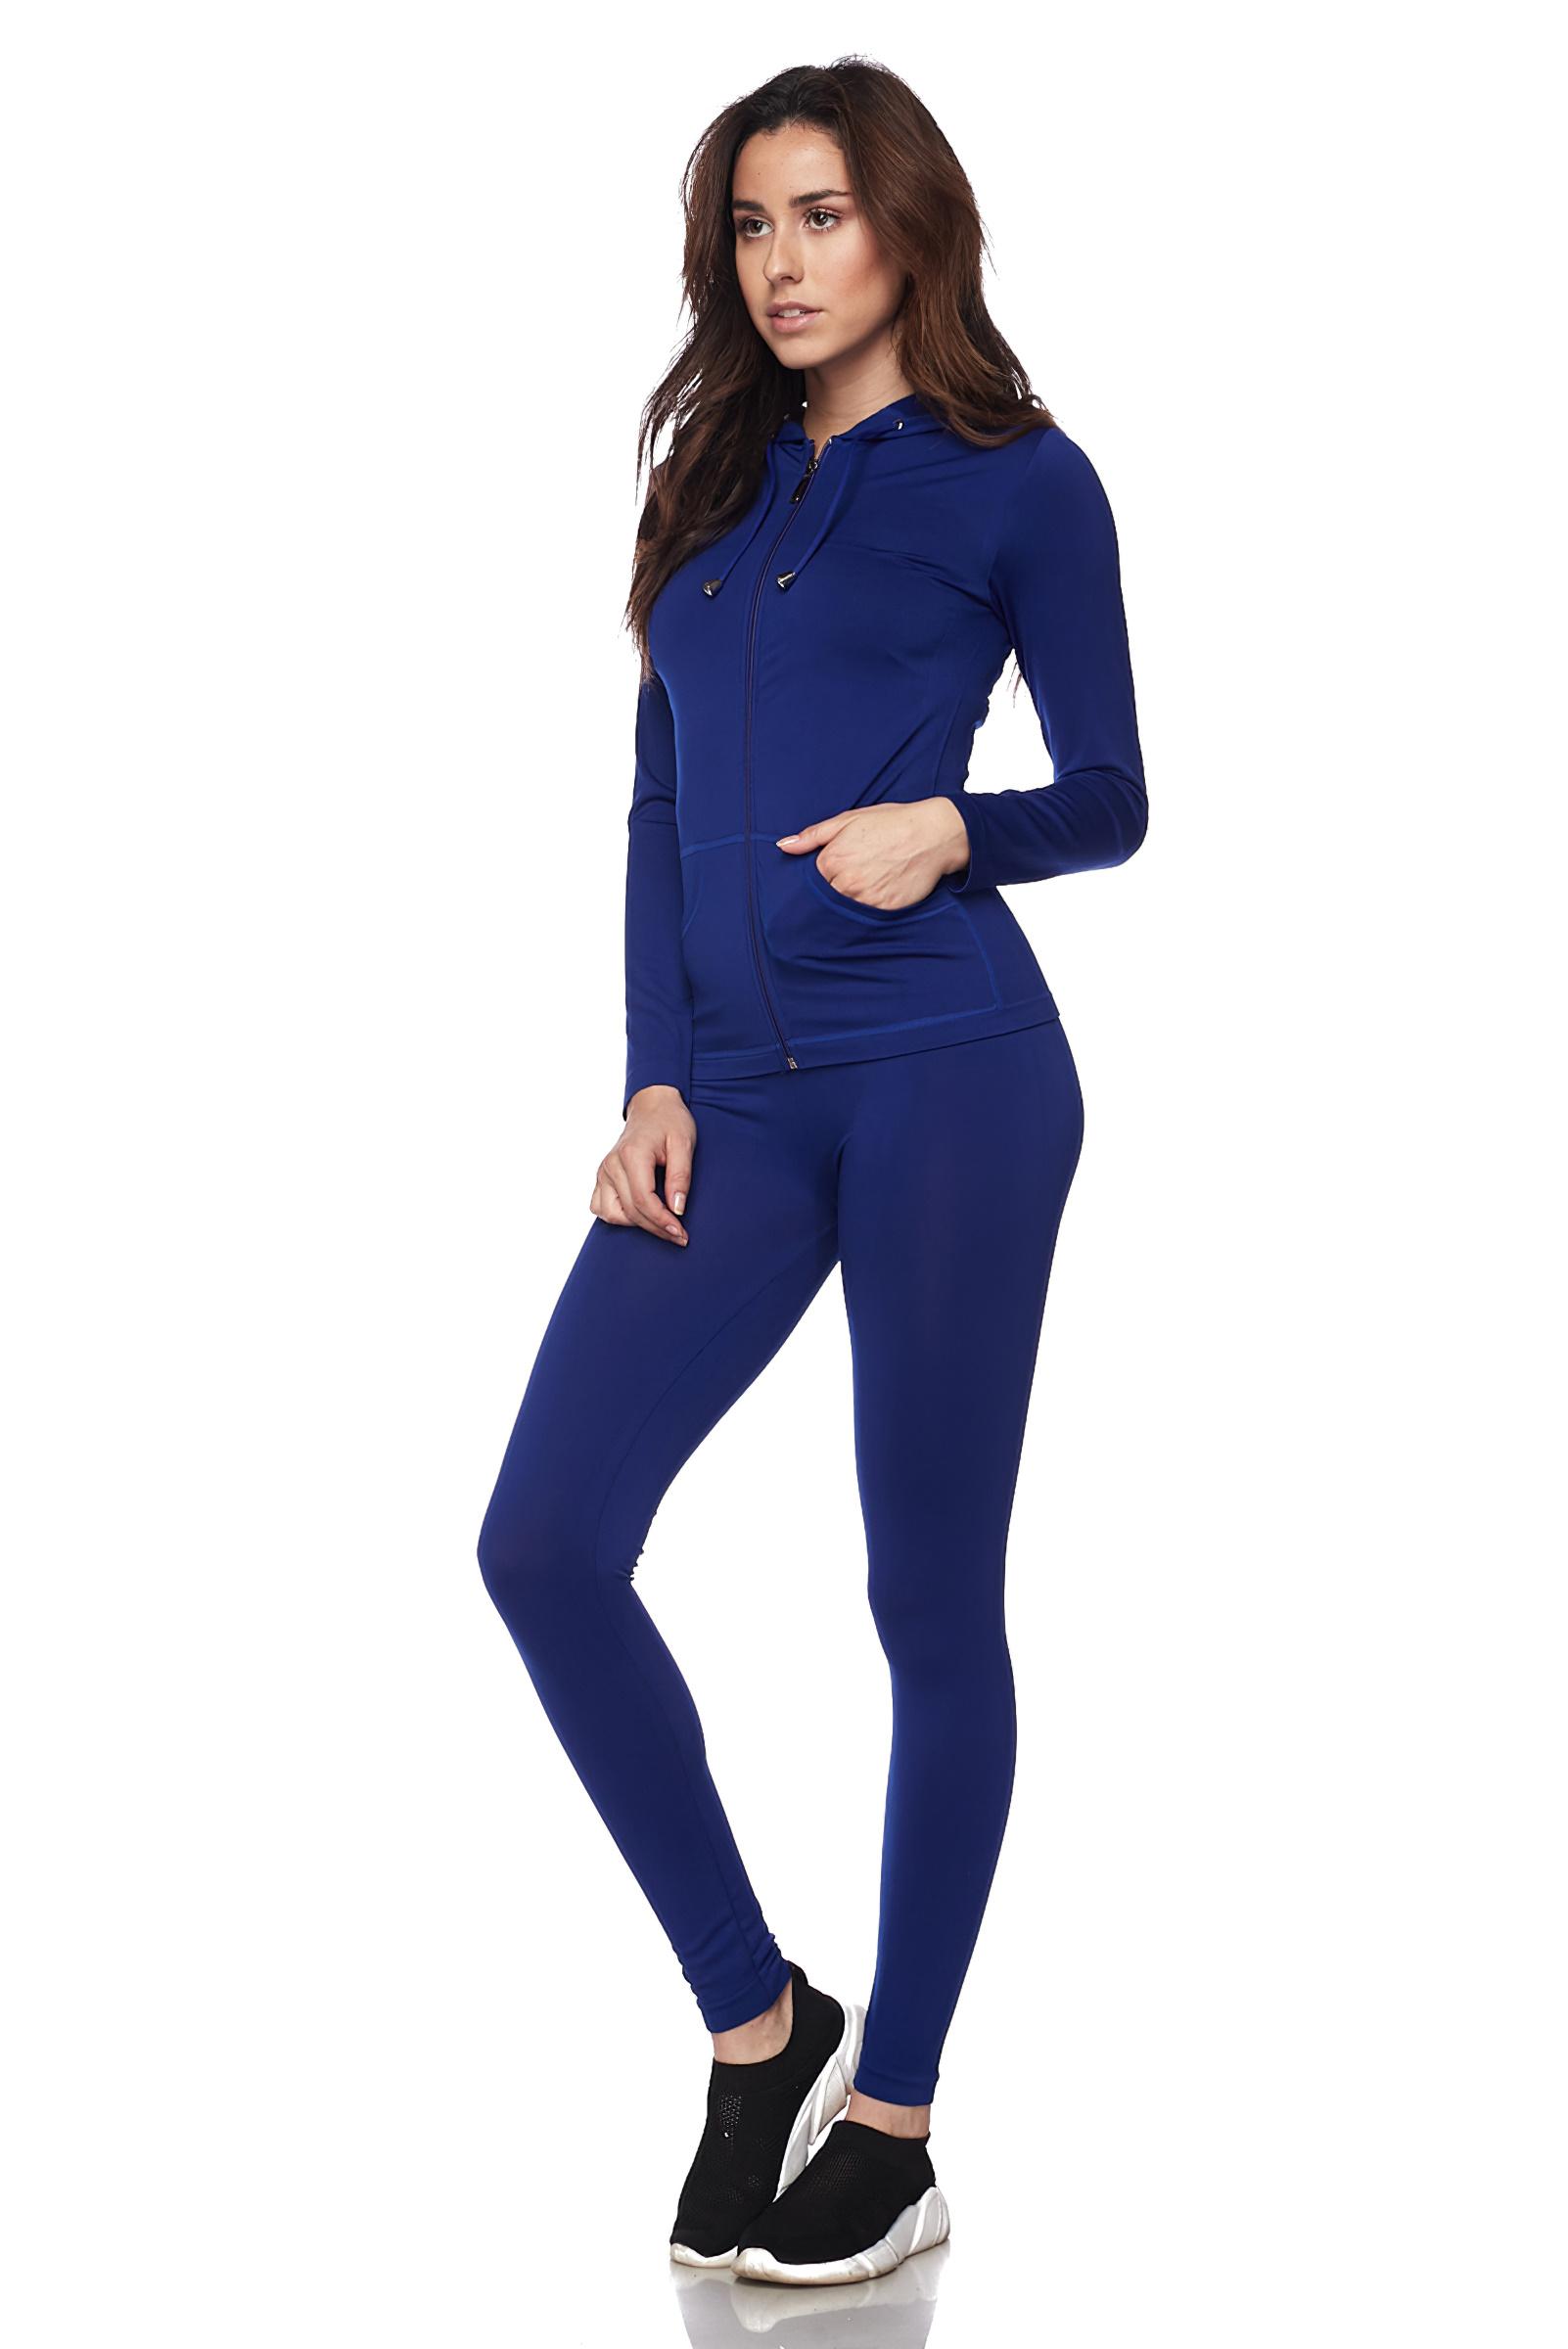 Women-039-s-Juniors-Active-Set-Wear-Zip-Up-Hoodie-and-Legging thumbnail 45